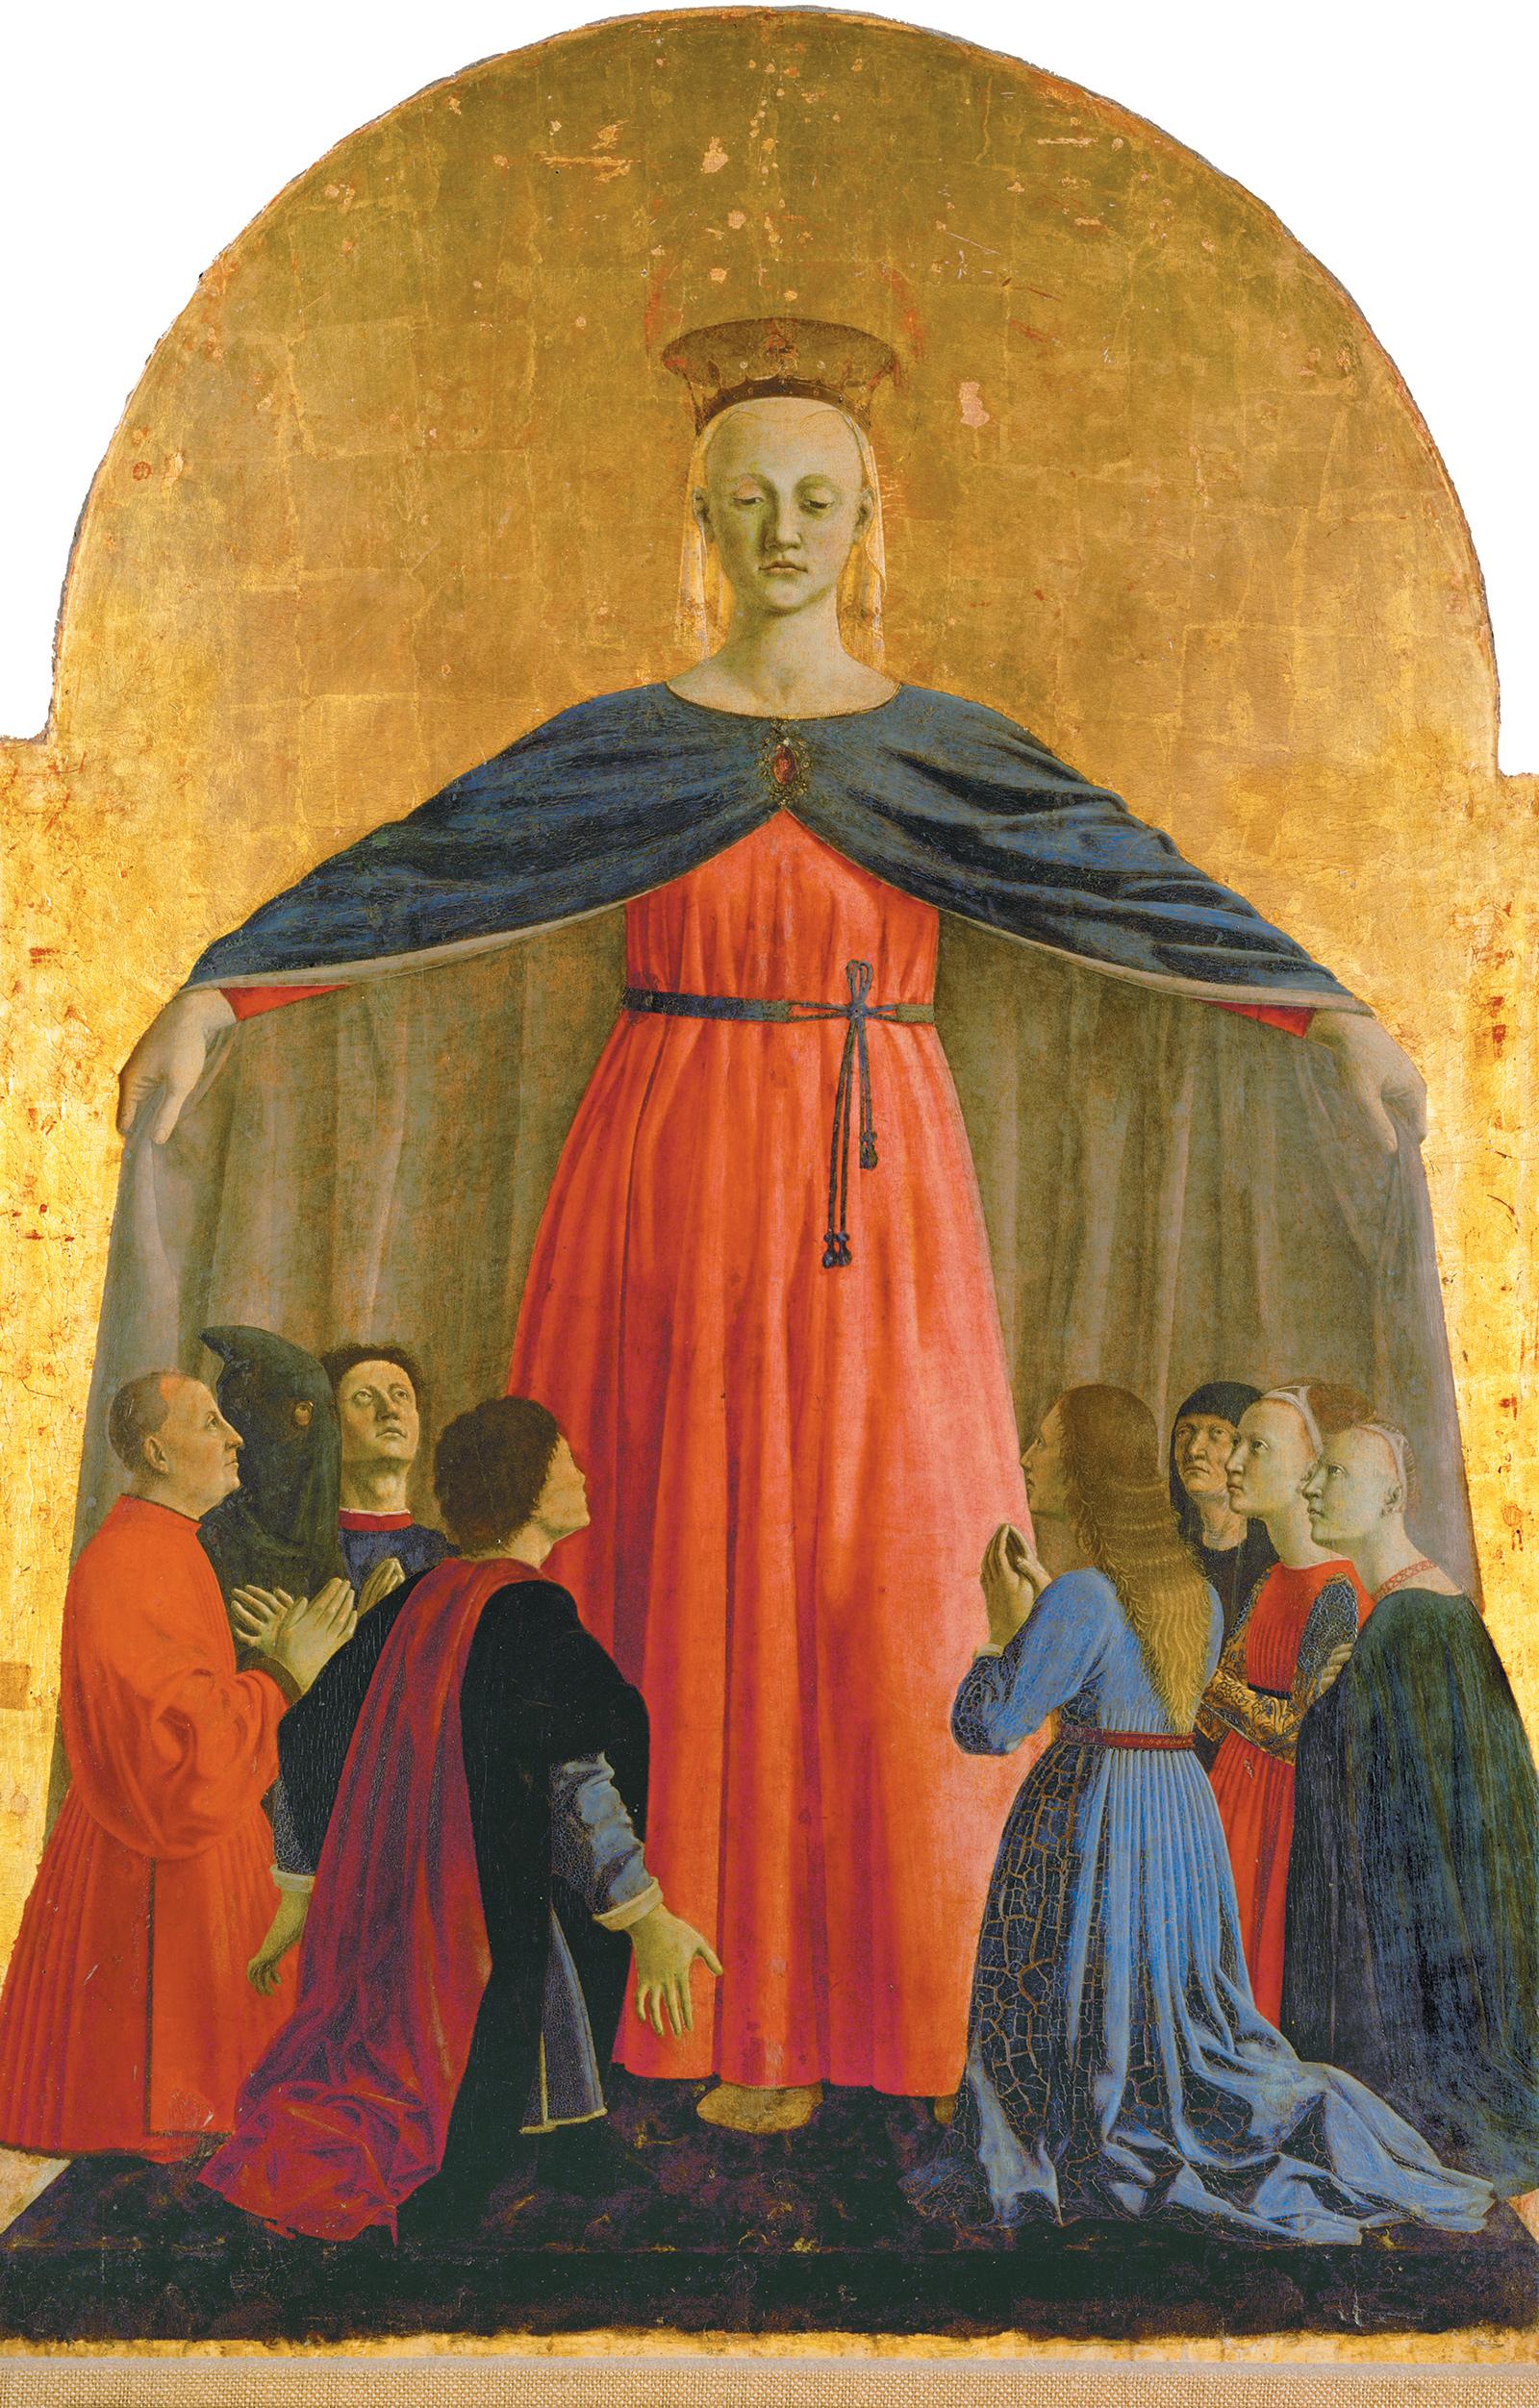 Piero della Francesca: Virgin of Mercy, the center panel of the Misericordia Polyptych, 1445–1462